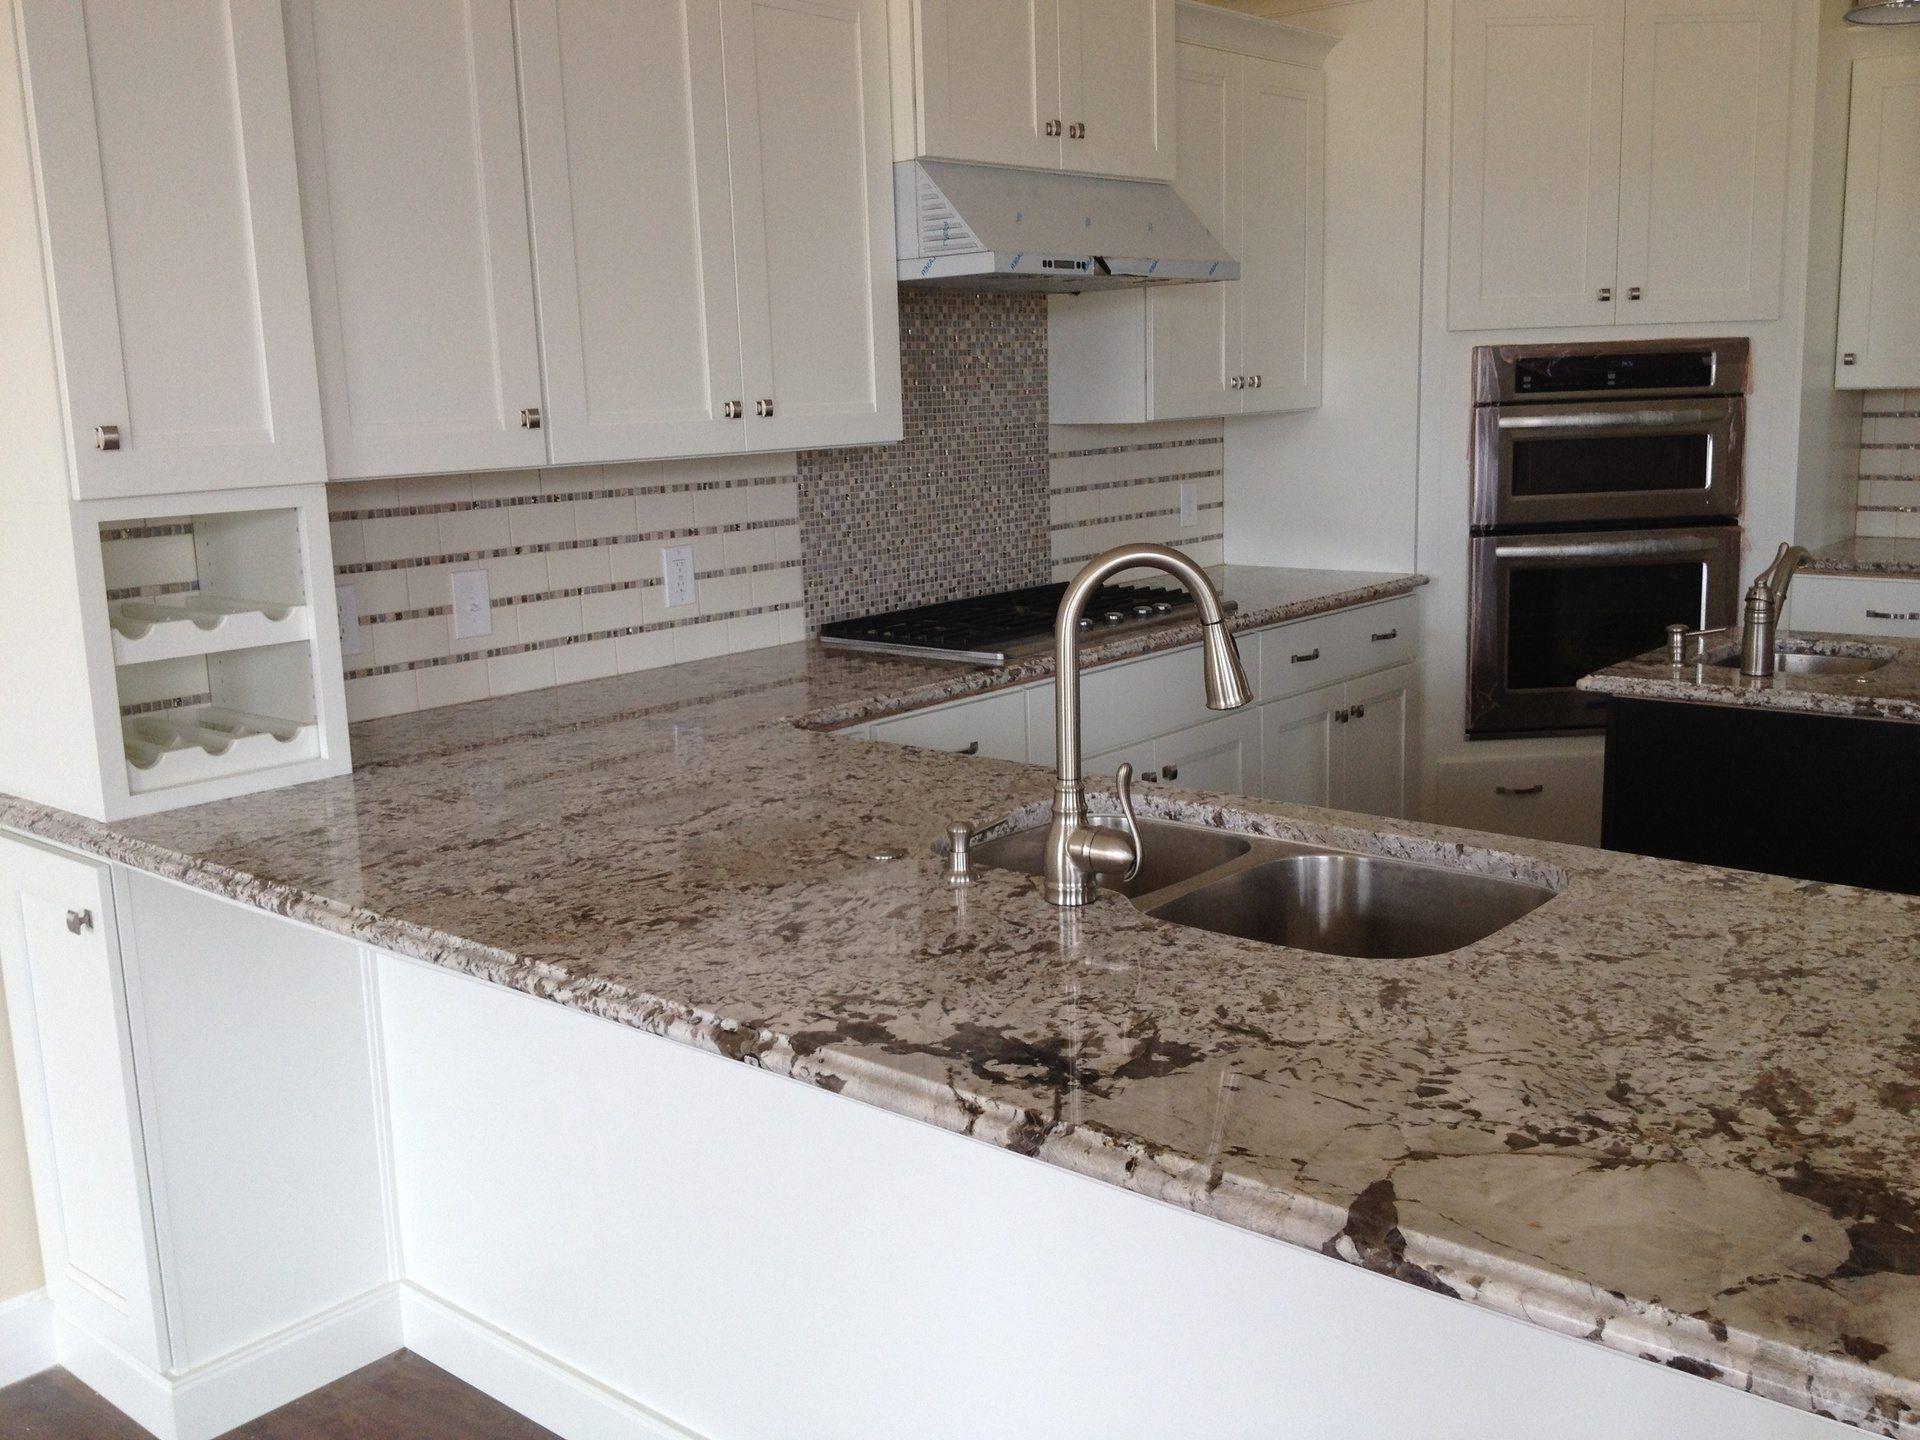 Kitchen Granite Countertops Bianco Antico Granite Prefab Kitchen Countertops Countertops Prefab Granite